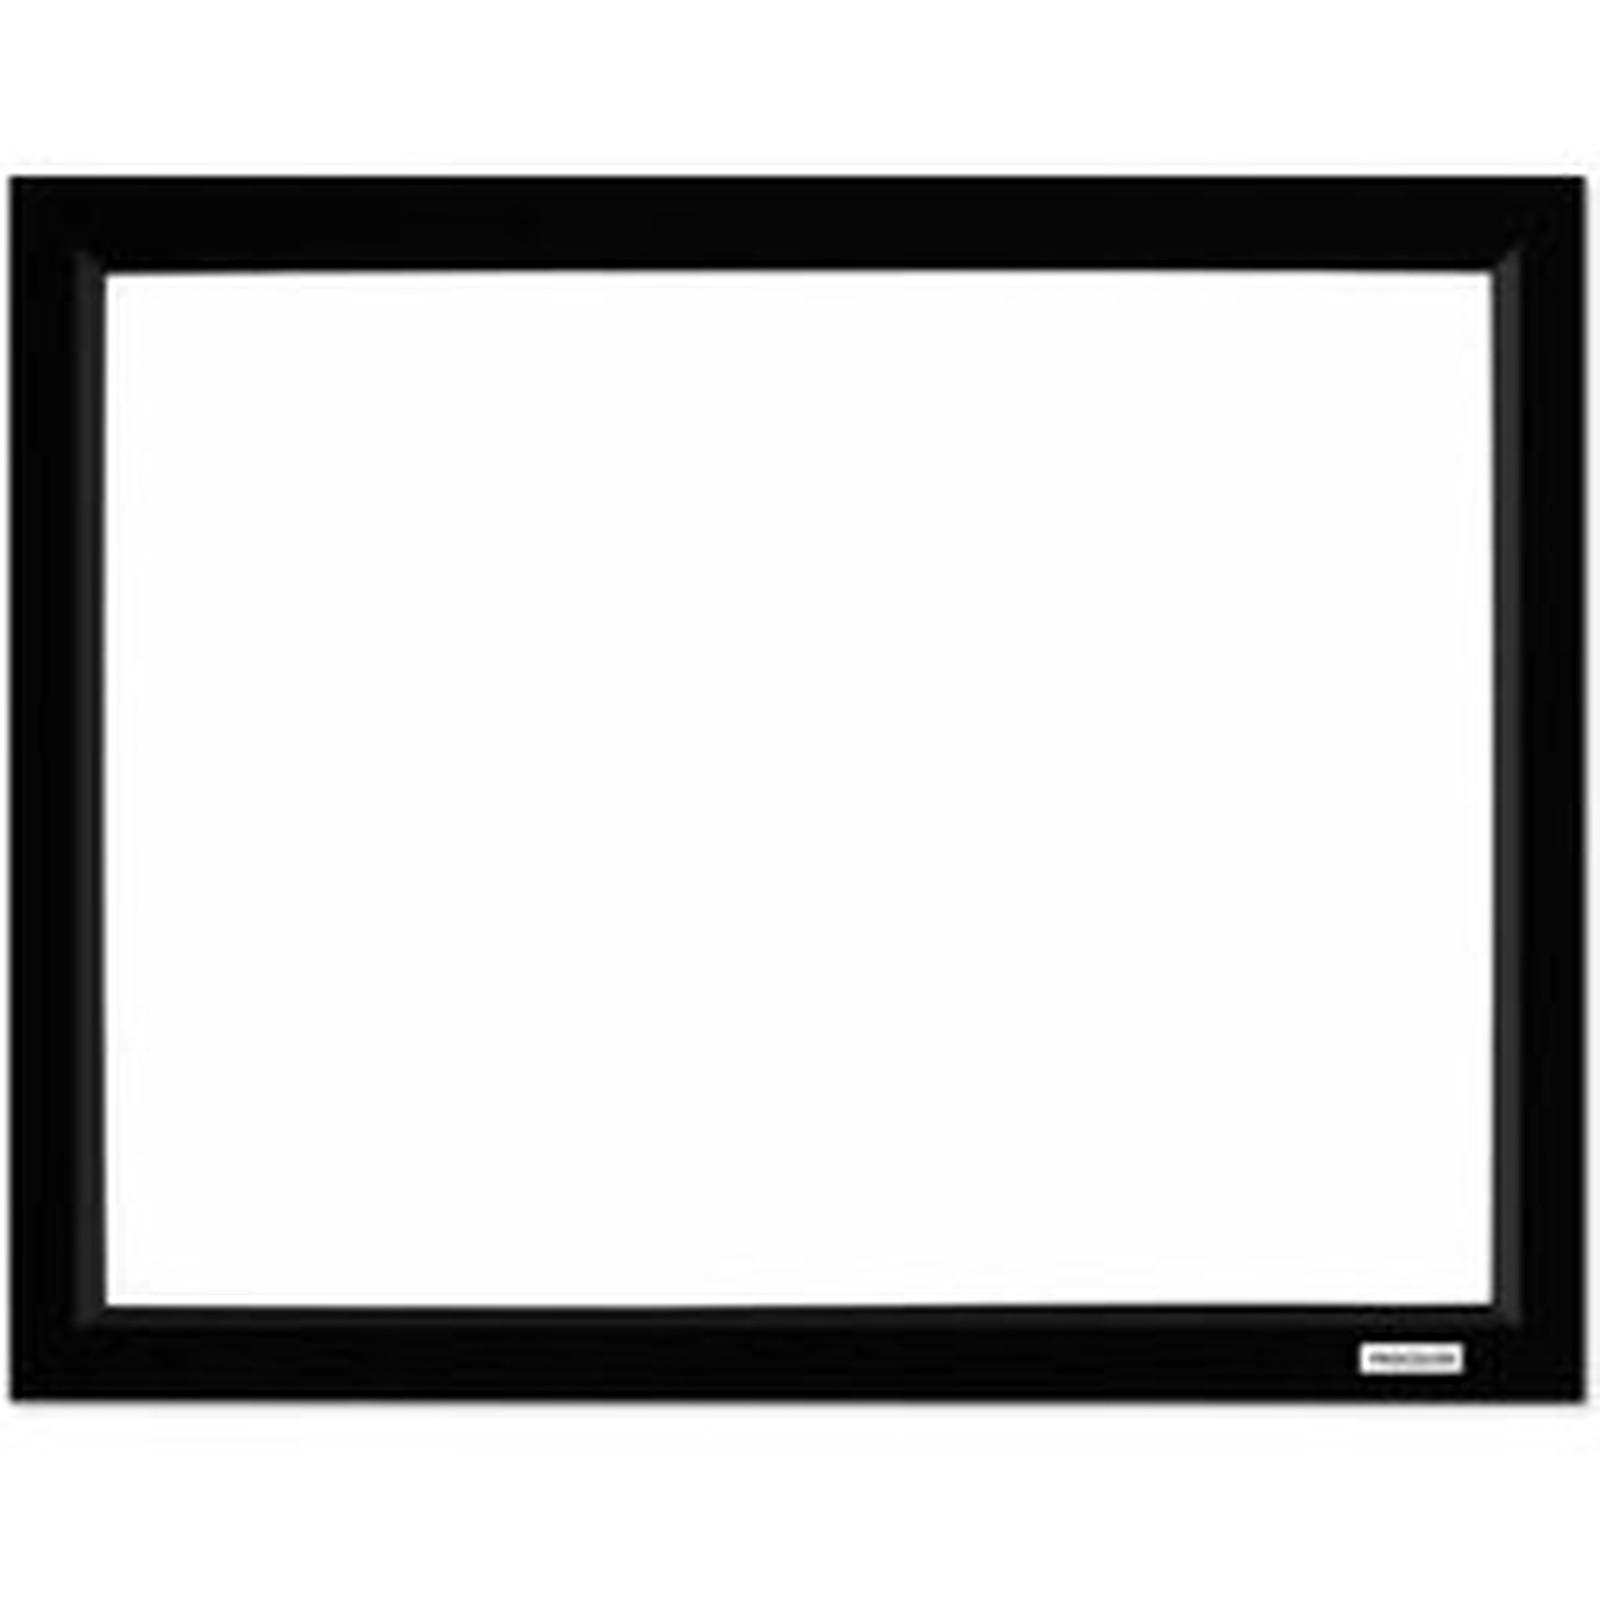 Procolor HOME-SCREEN Deluxe - Ecran cadre - Format 4:3 - 316x241 cm